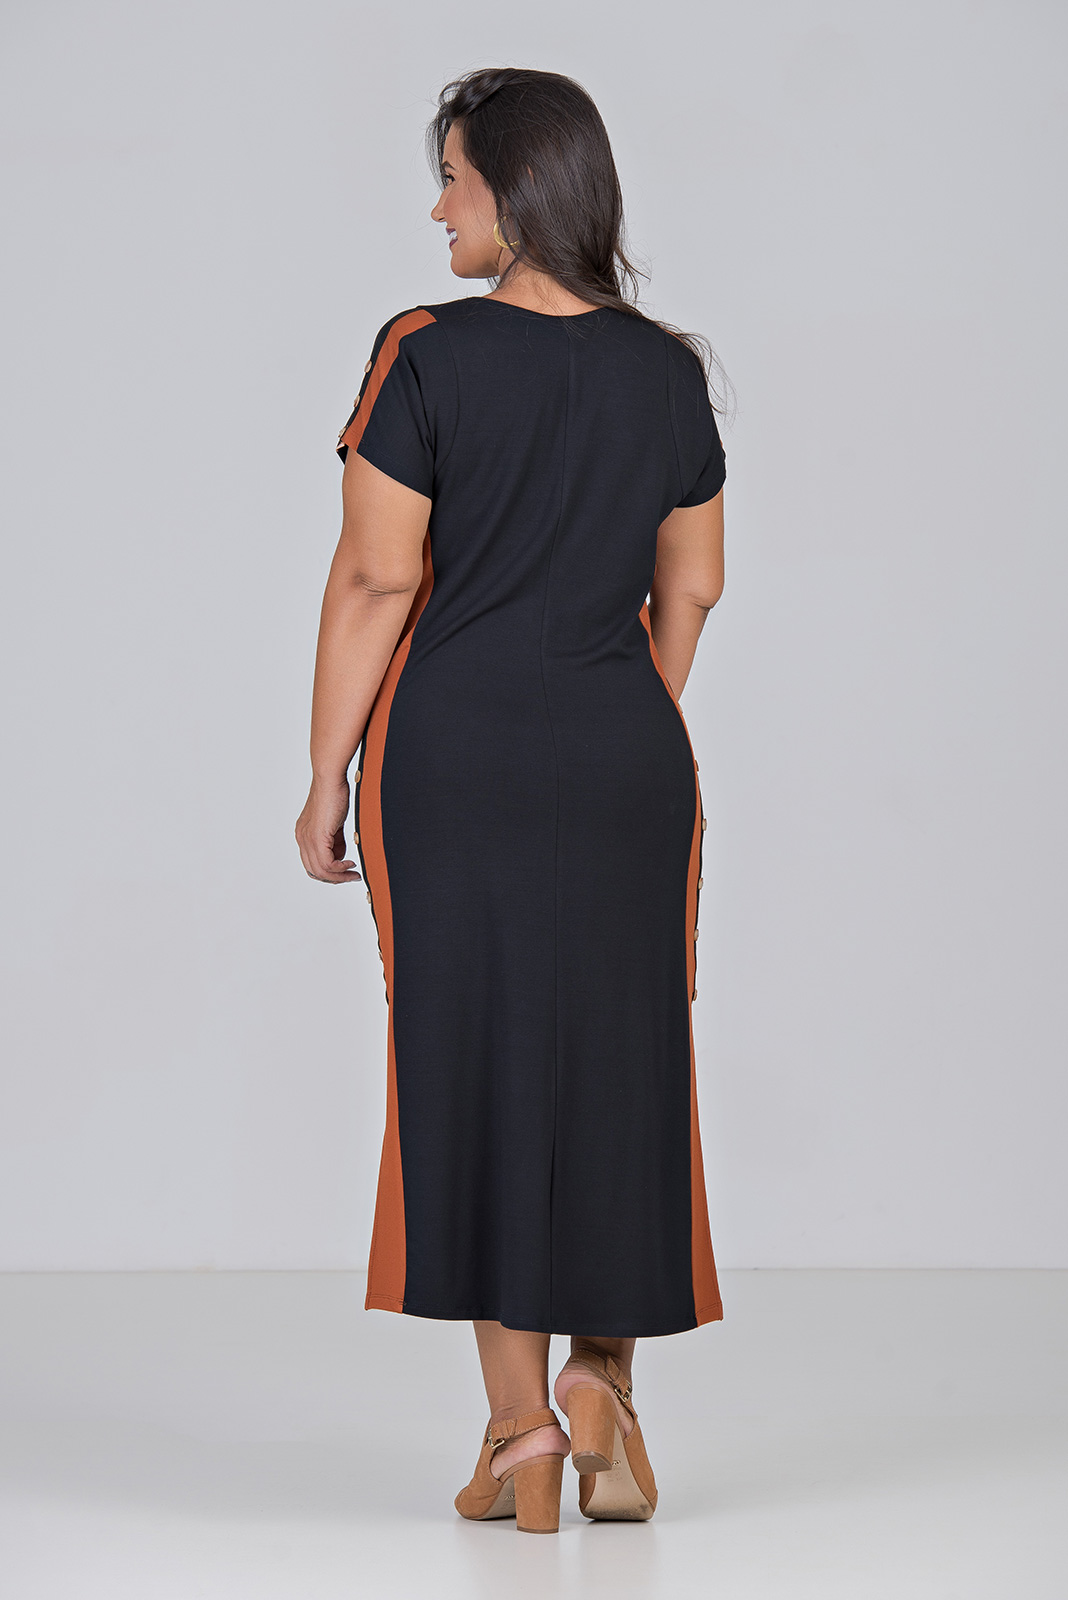 Vestido Midi em Malha Com Recortes - Plus Size